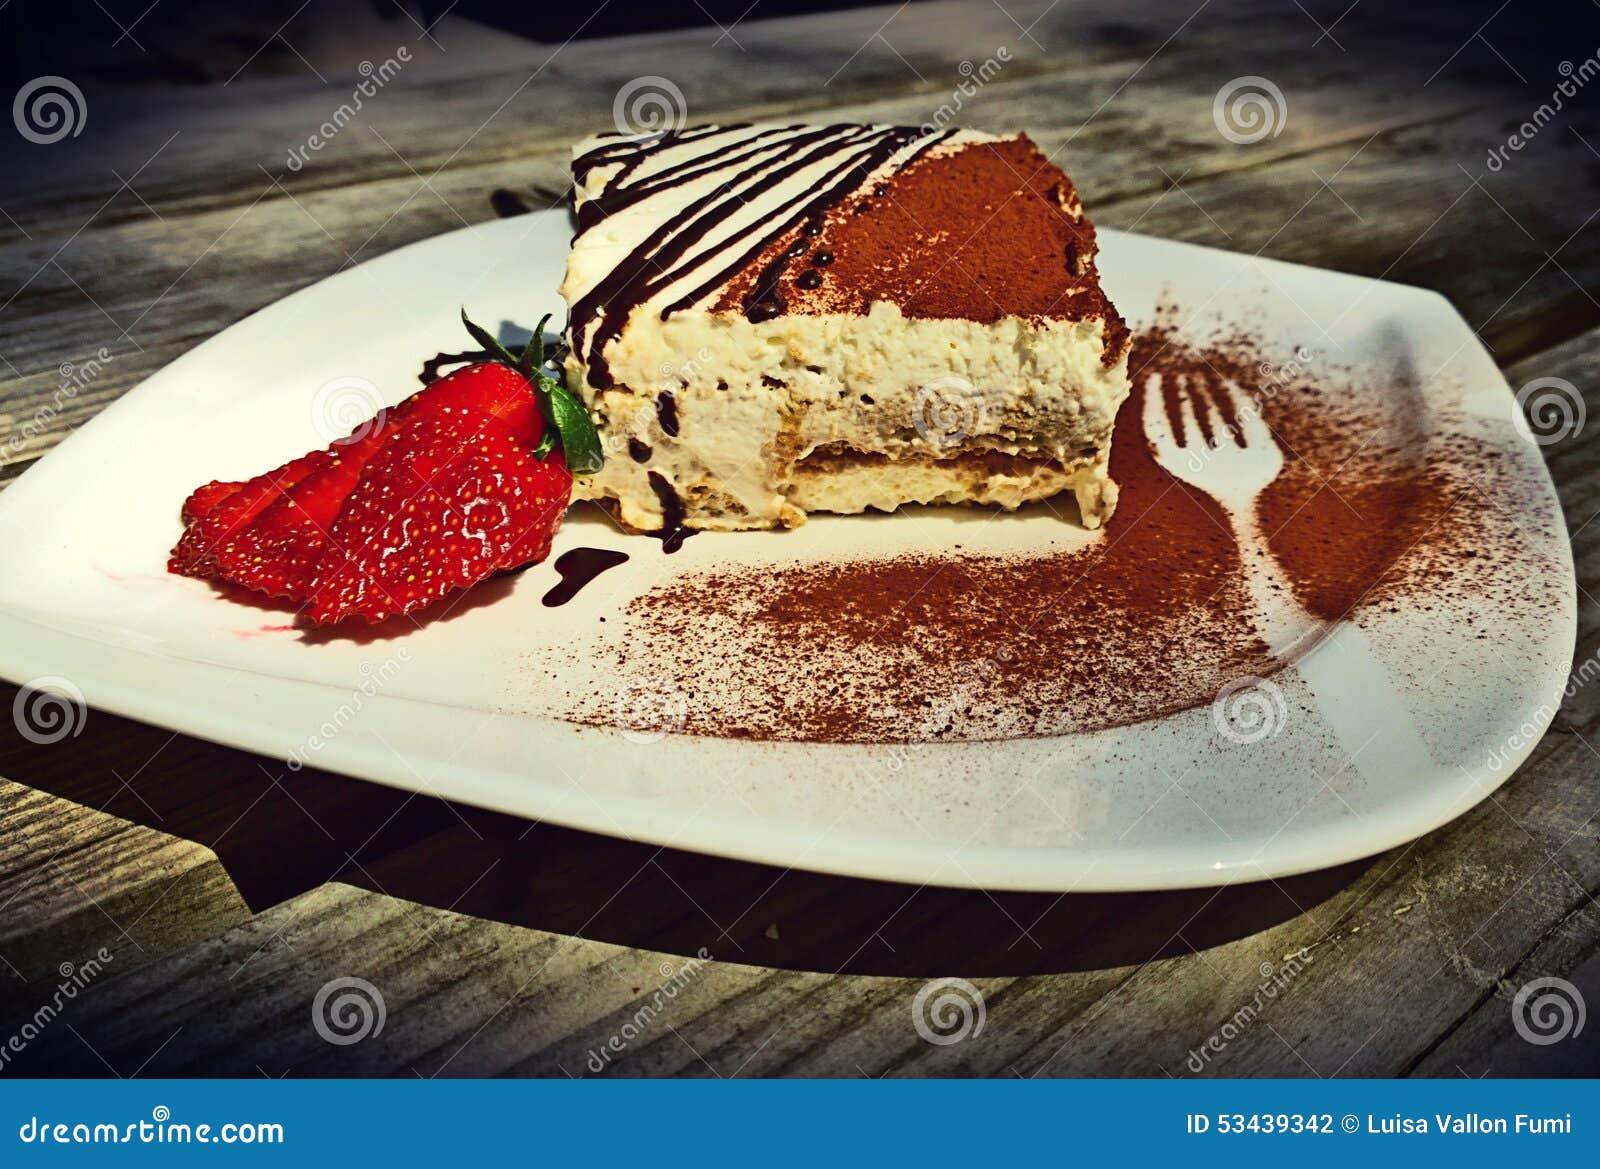 Delicious Portion Of Tiramisu On White Saucer Stock Photo - Image of on